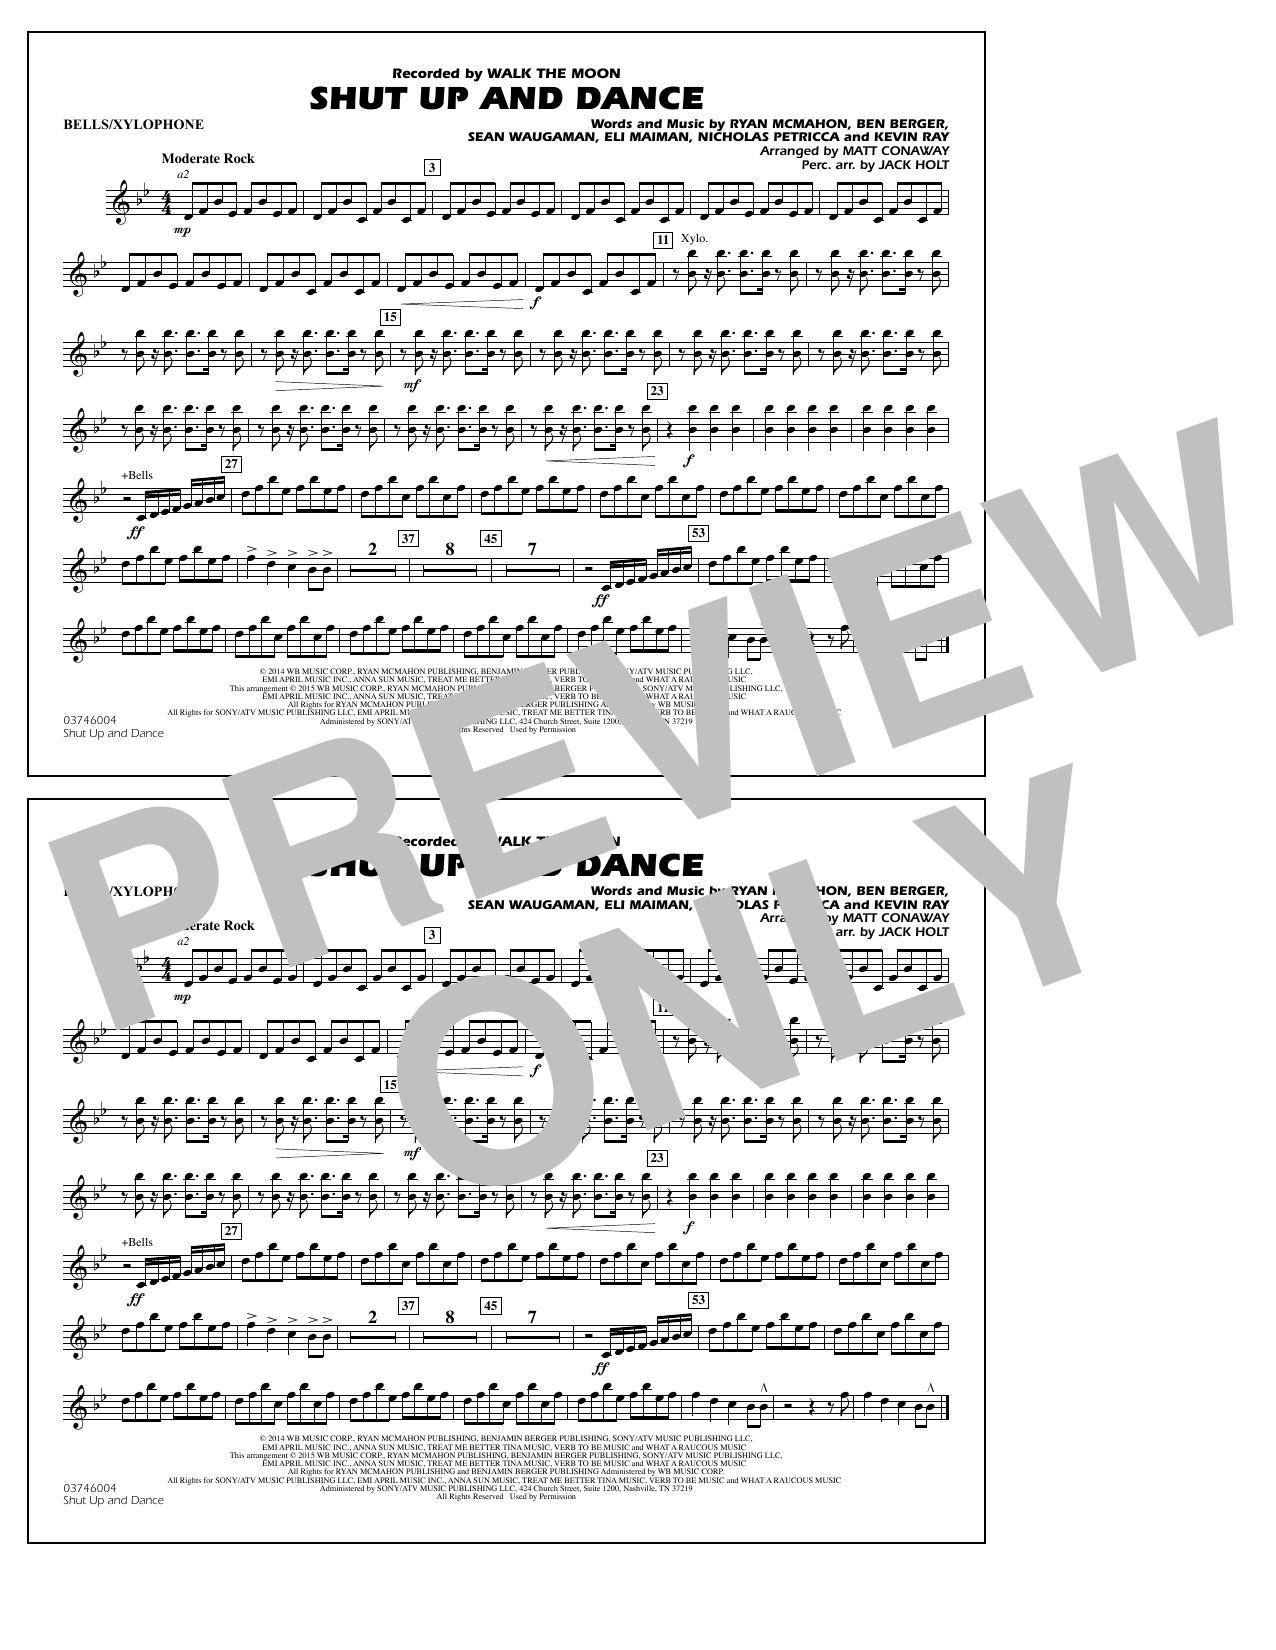 Walk The Moon Shut Up and Dance (Arr. Matt Conaway) - Bells/Xylophone sheet music notes and chords